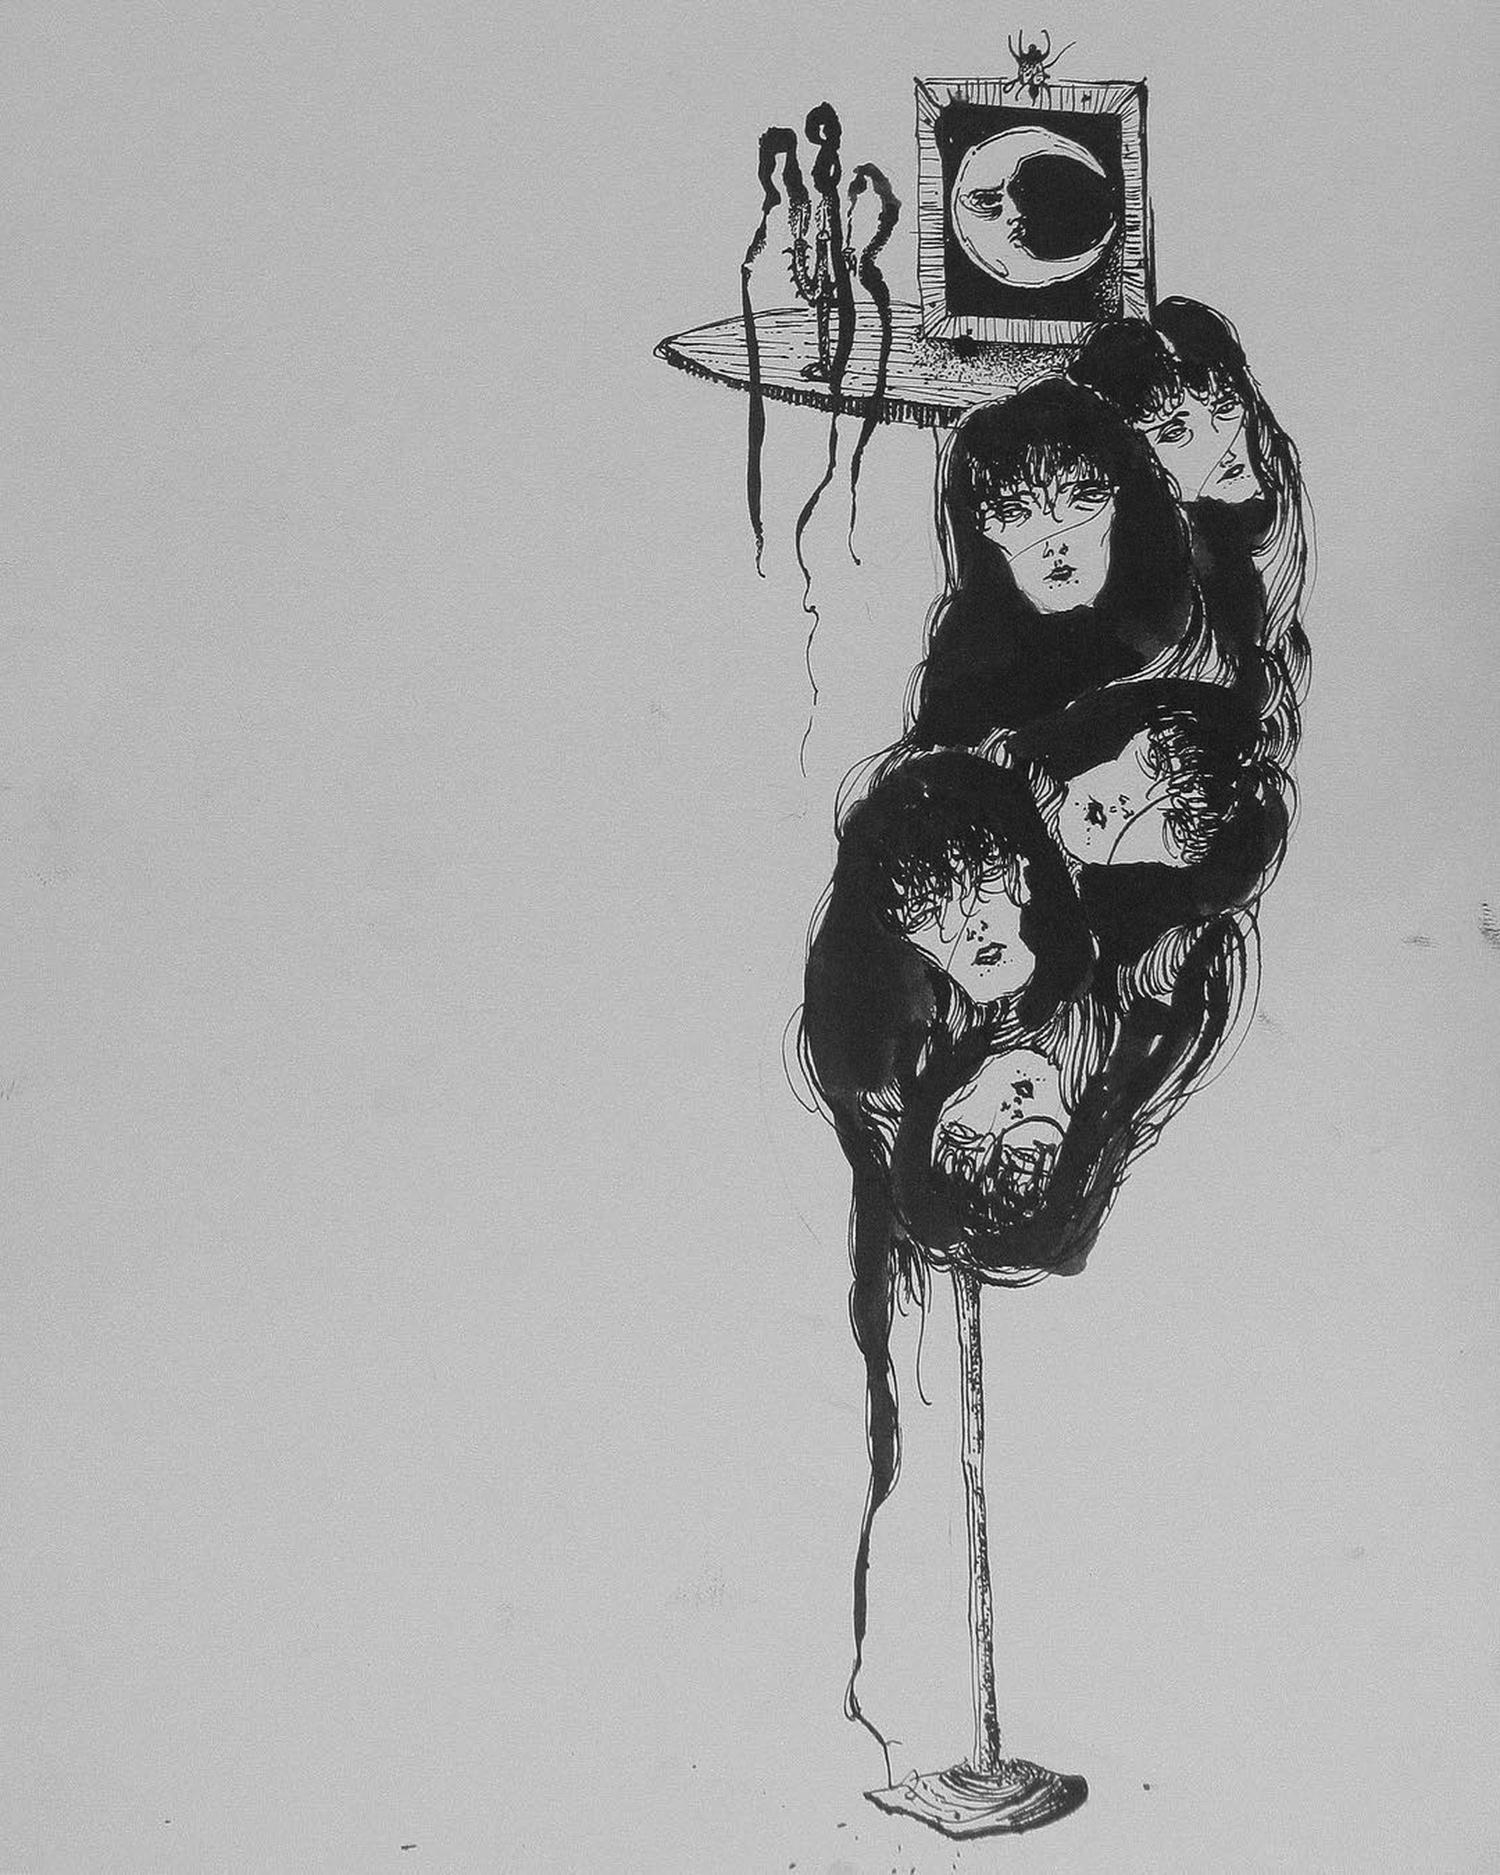 Suhwan Bak - Goth Gloomy tattoo - face cluster